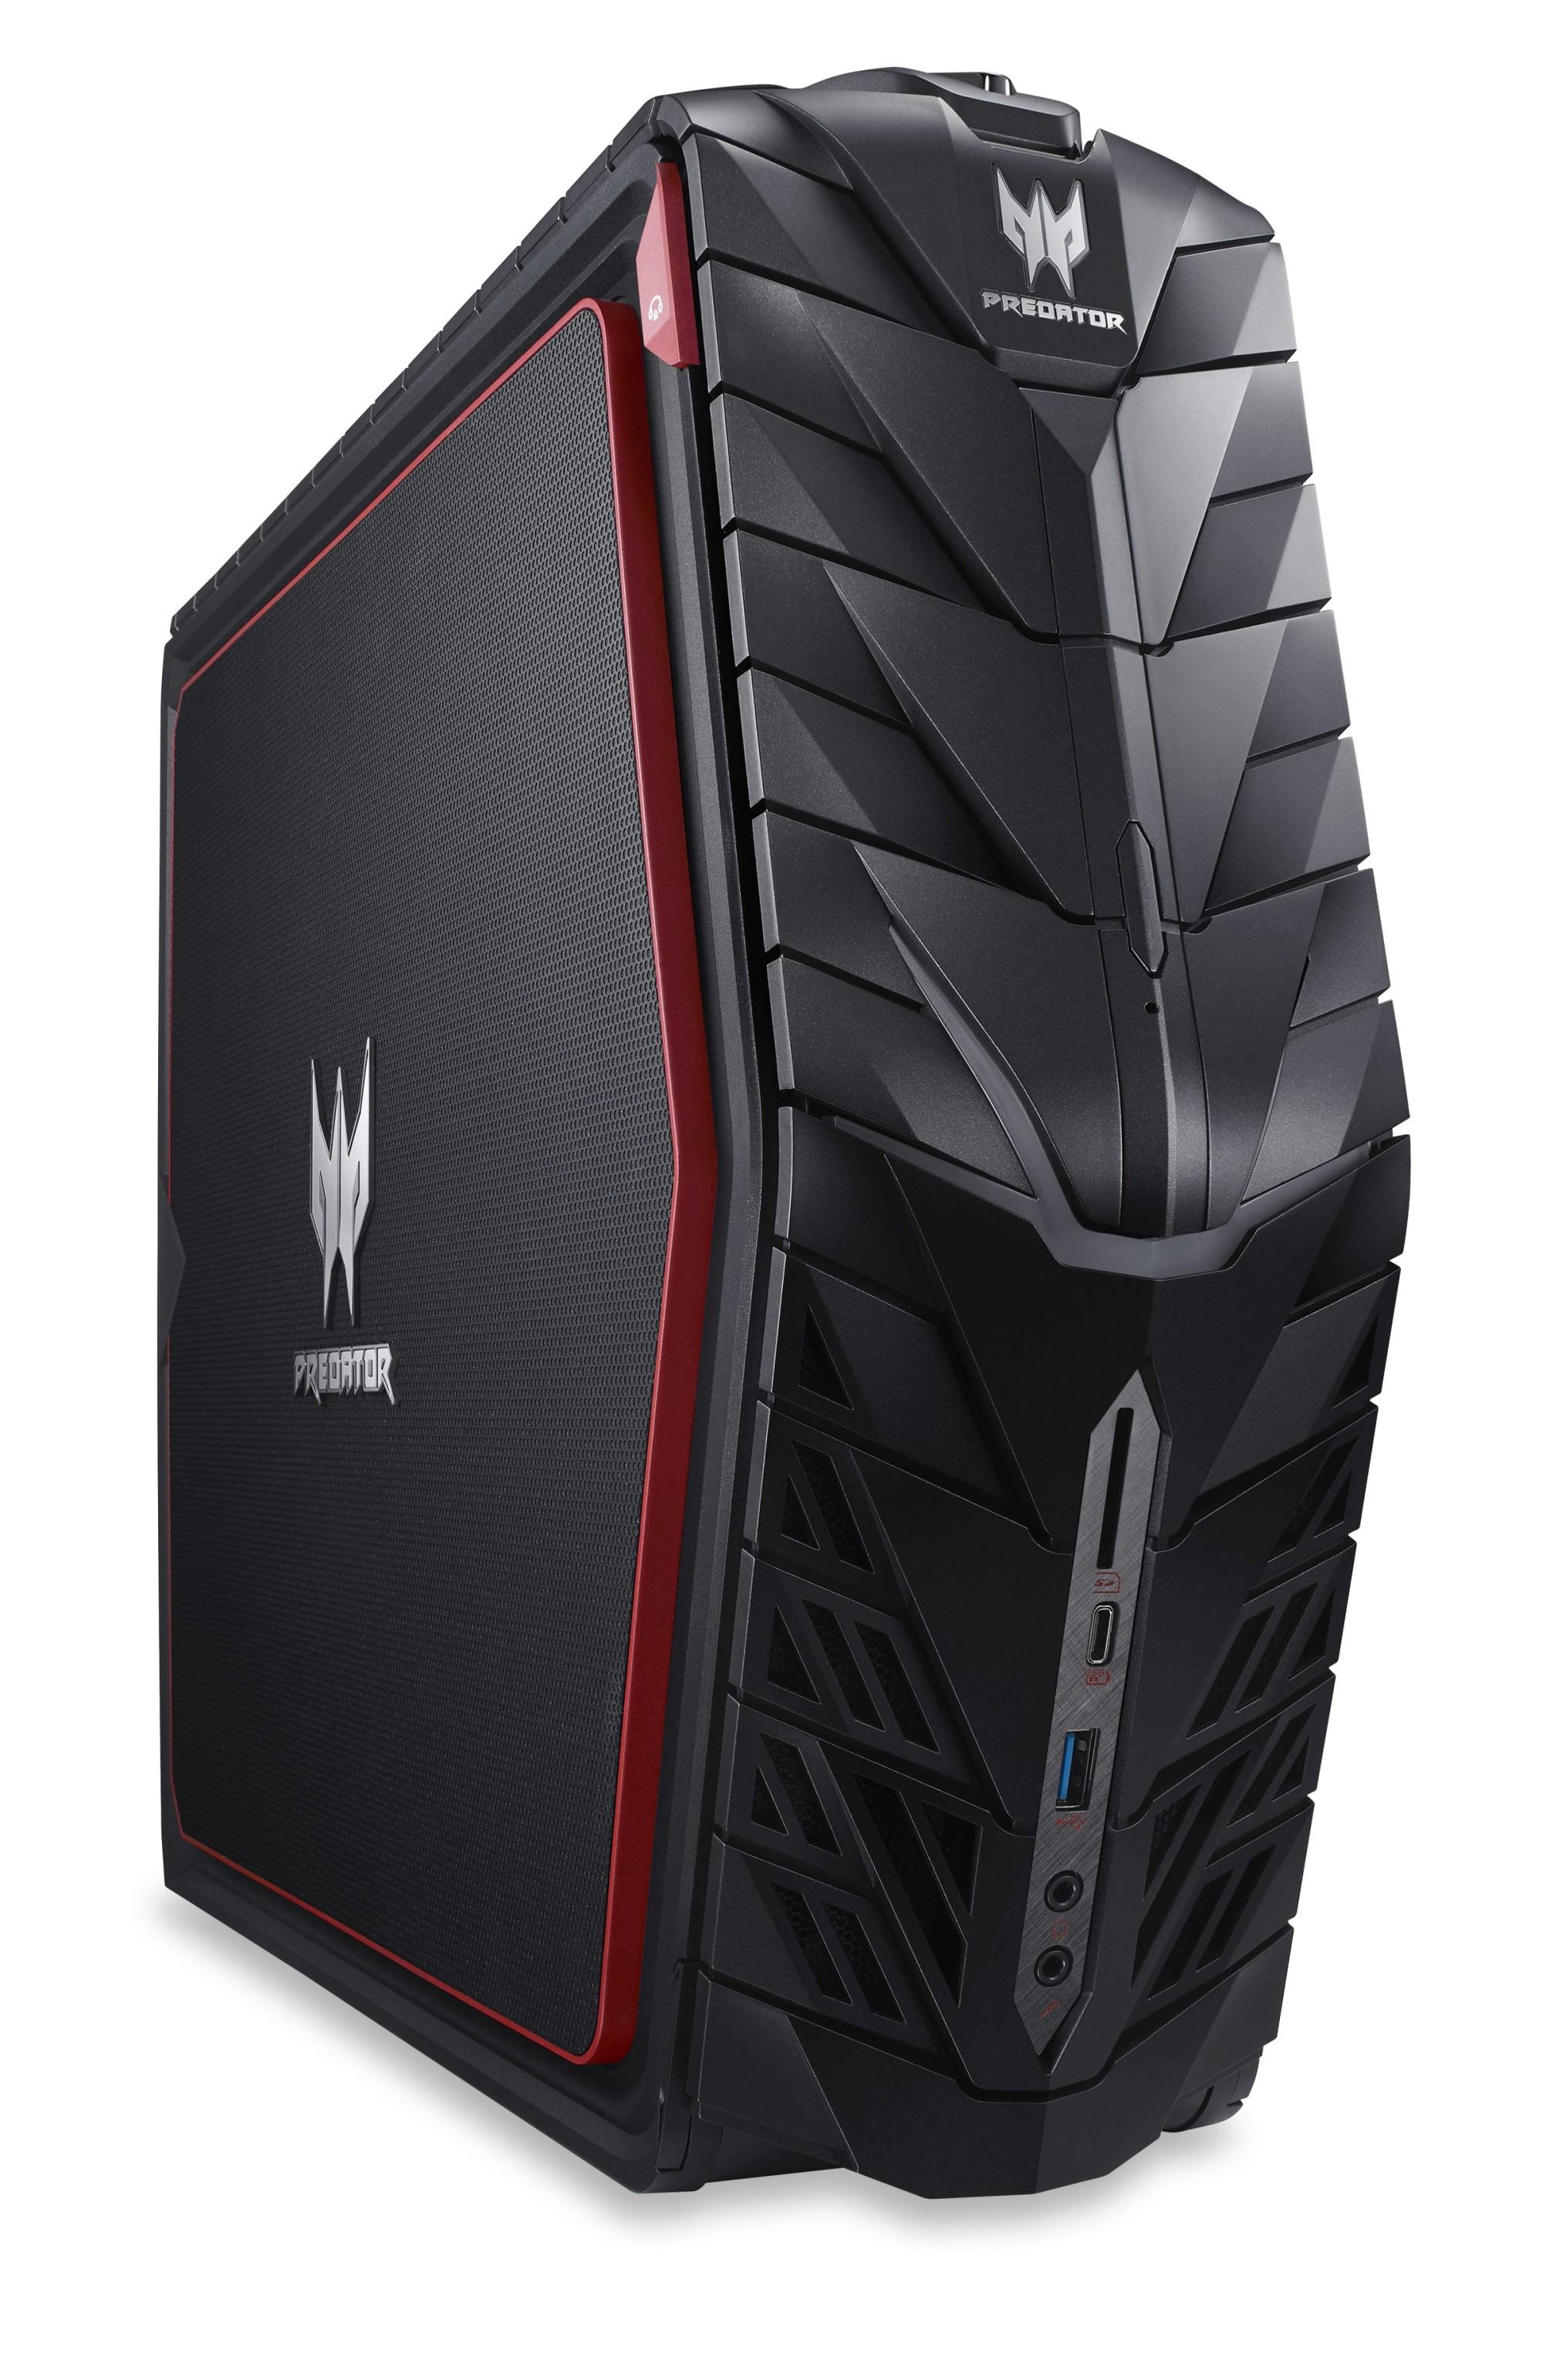 Acer Aspire G1-710 Predator Ci7-7700/8GB+8GB/256GB SSD+2TB 7200 ot./GTX 1070/DVDRW/W10 Home